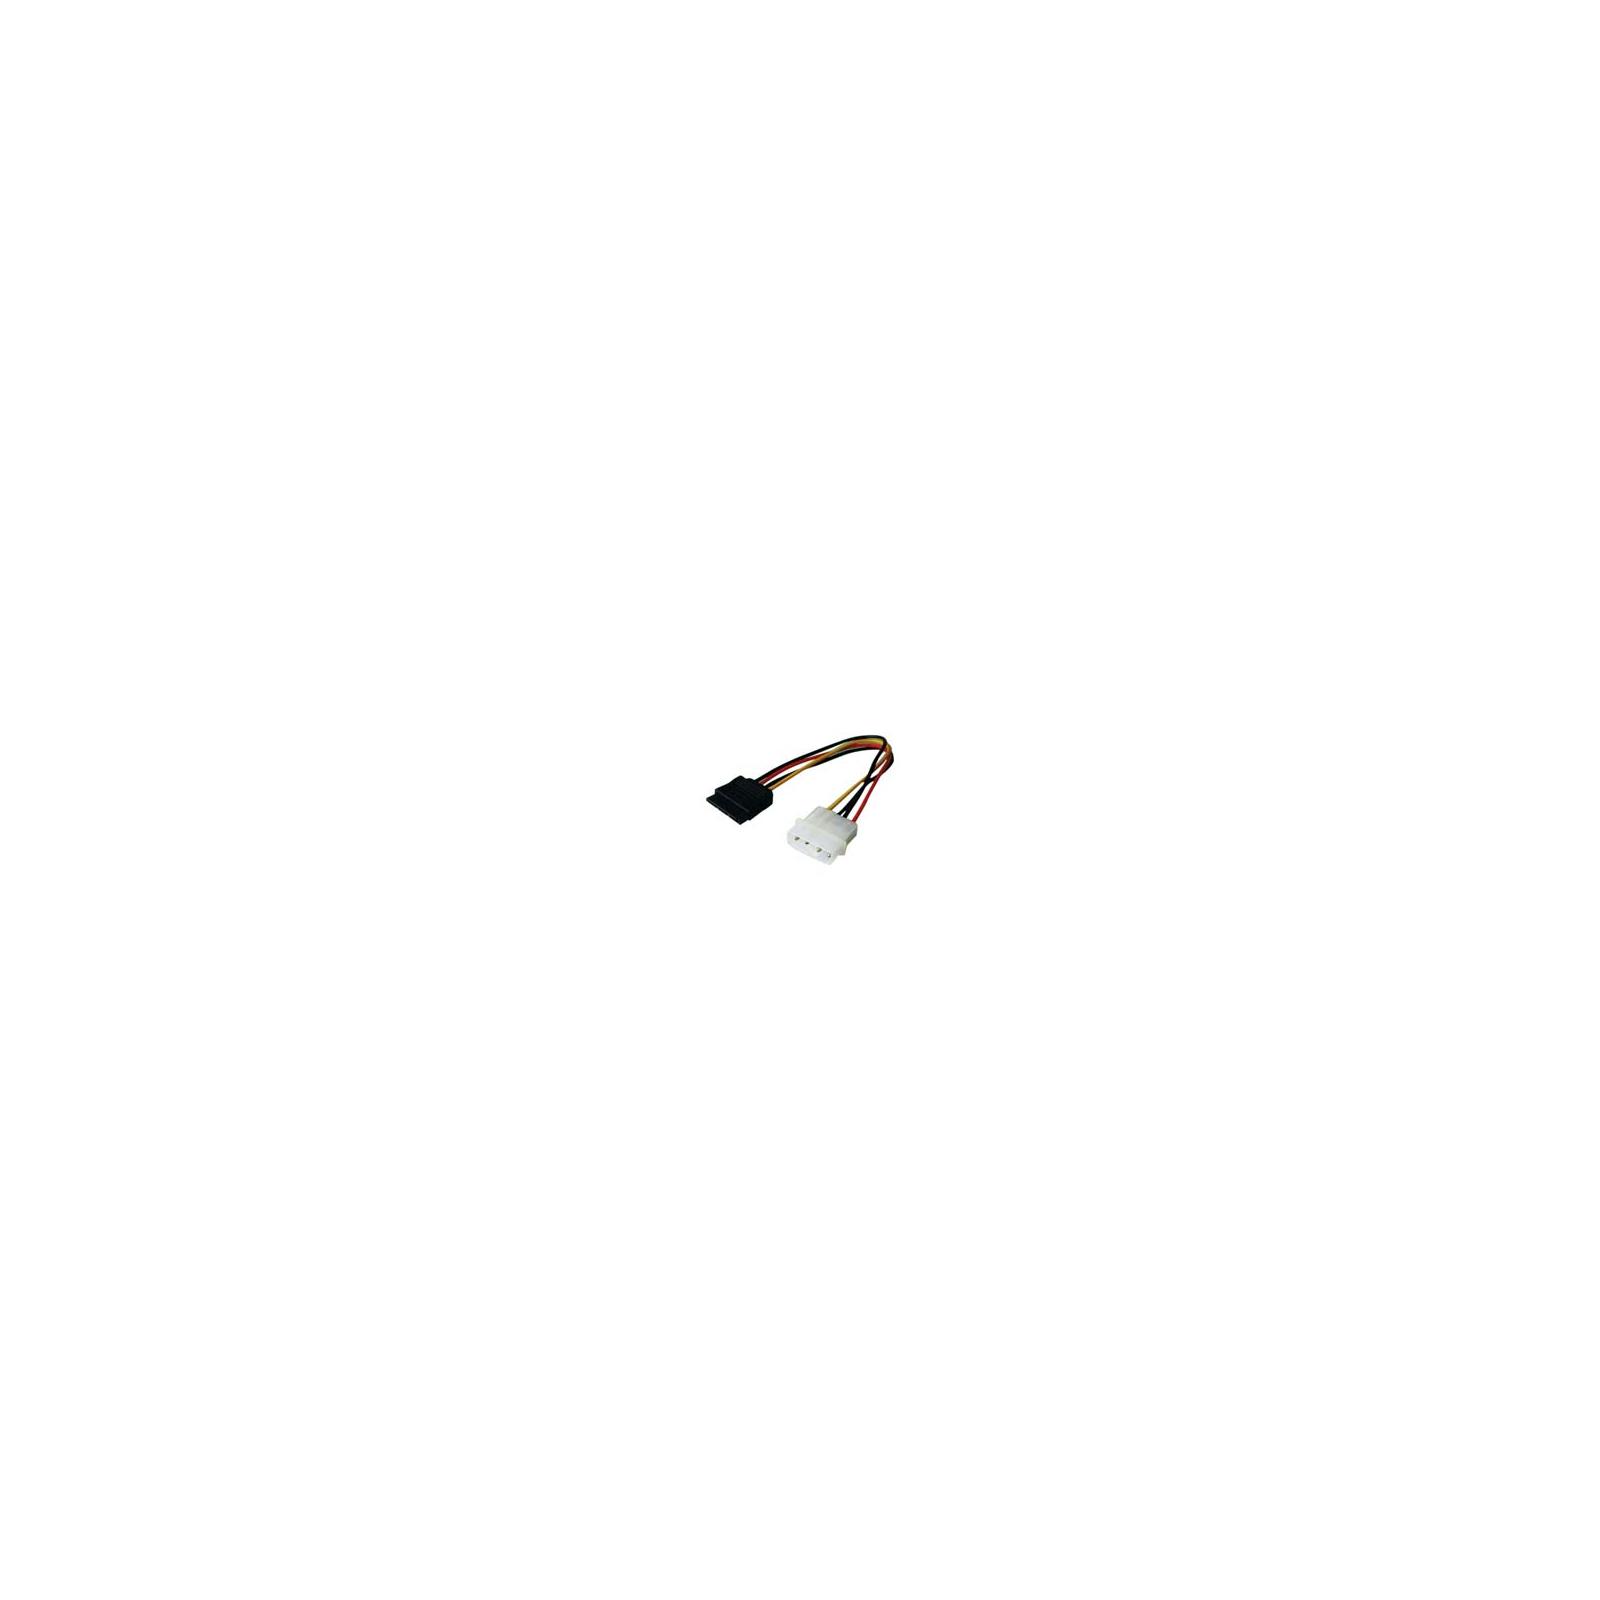 Кабель питания SATA-PS/P (power) Cablexpert (CC-SATA-PS)